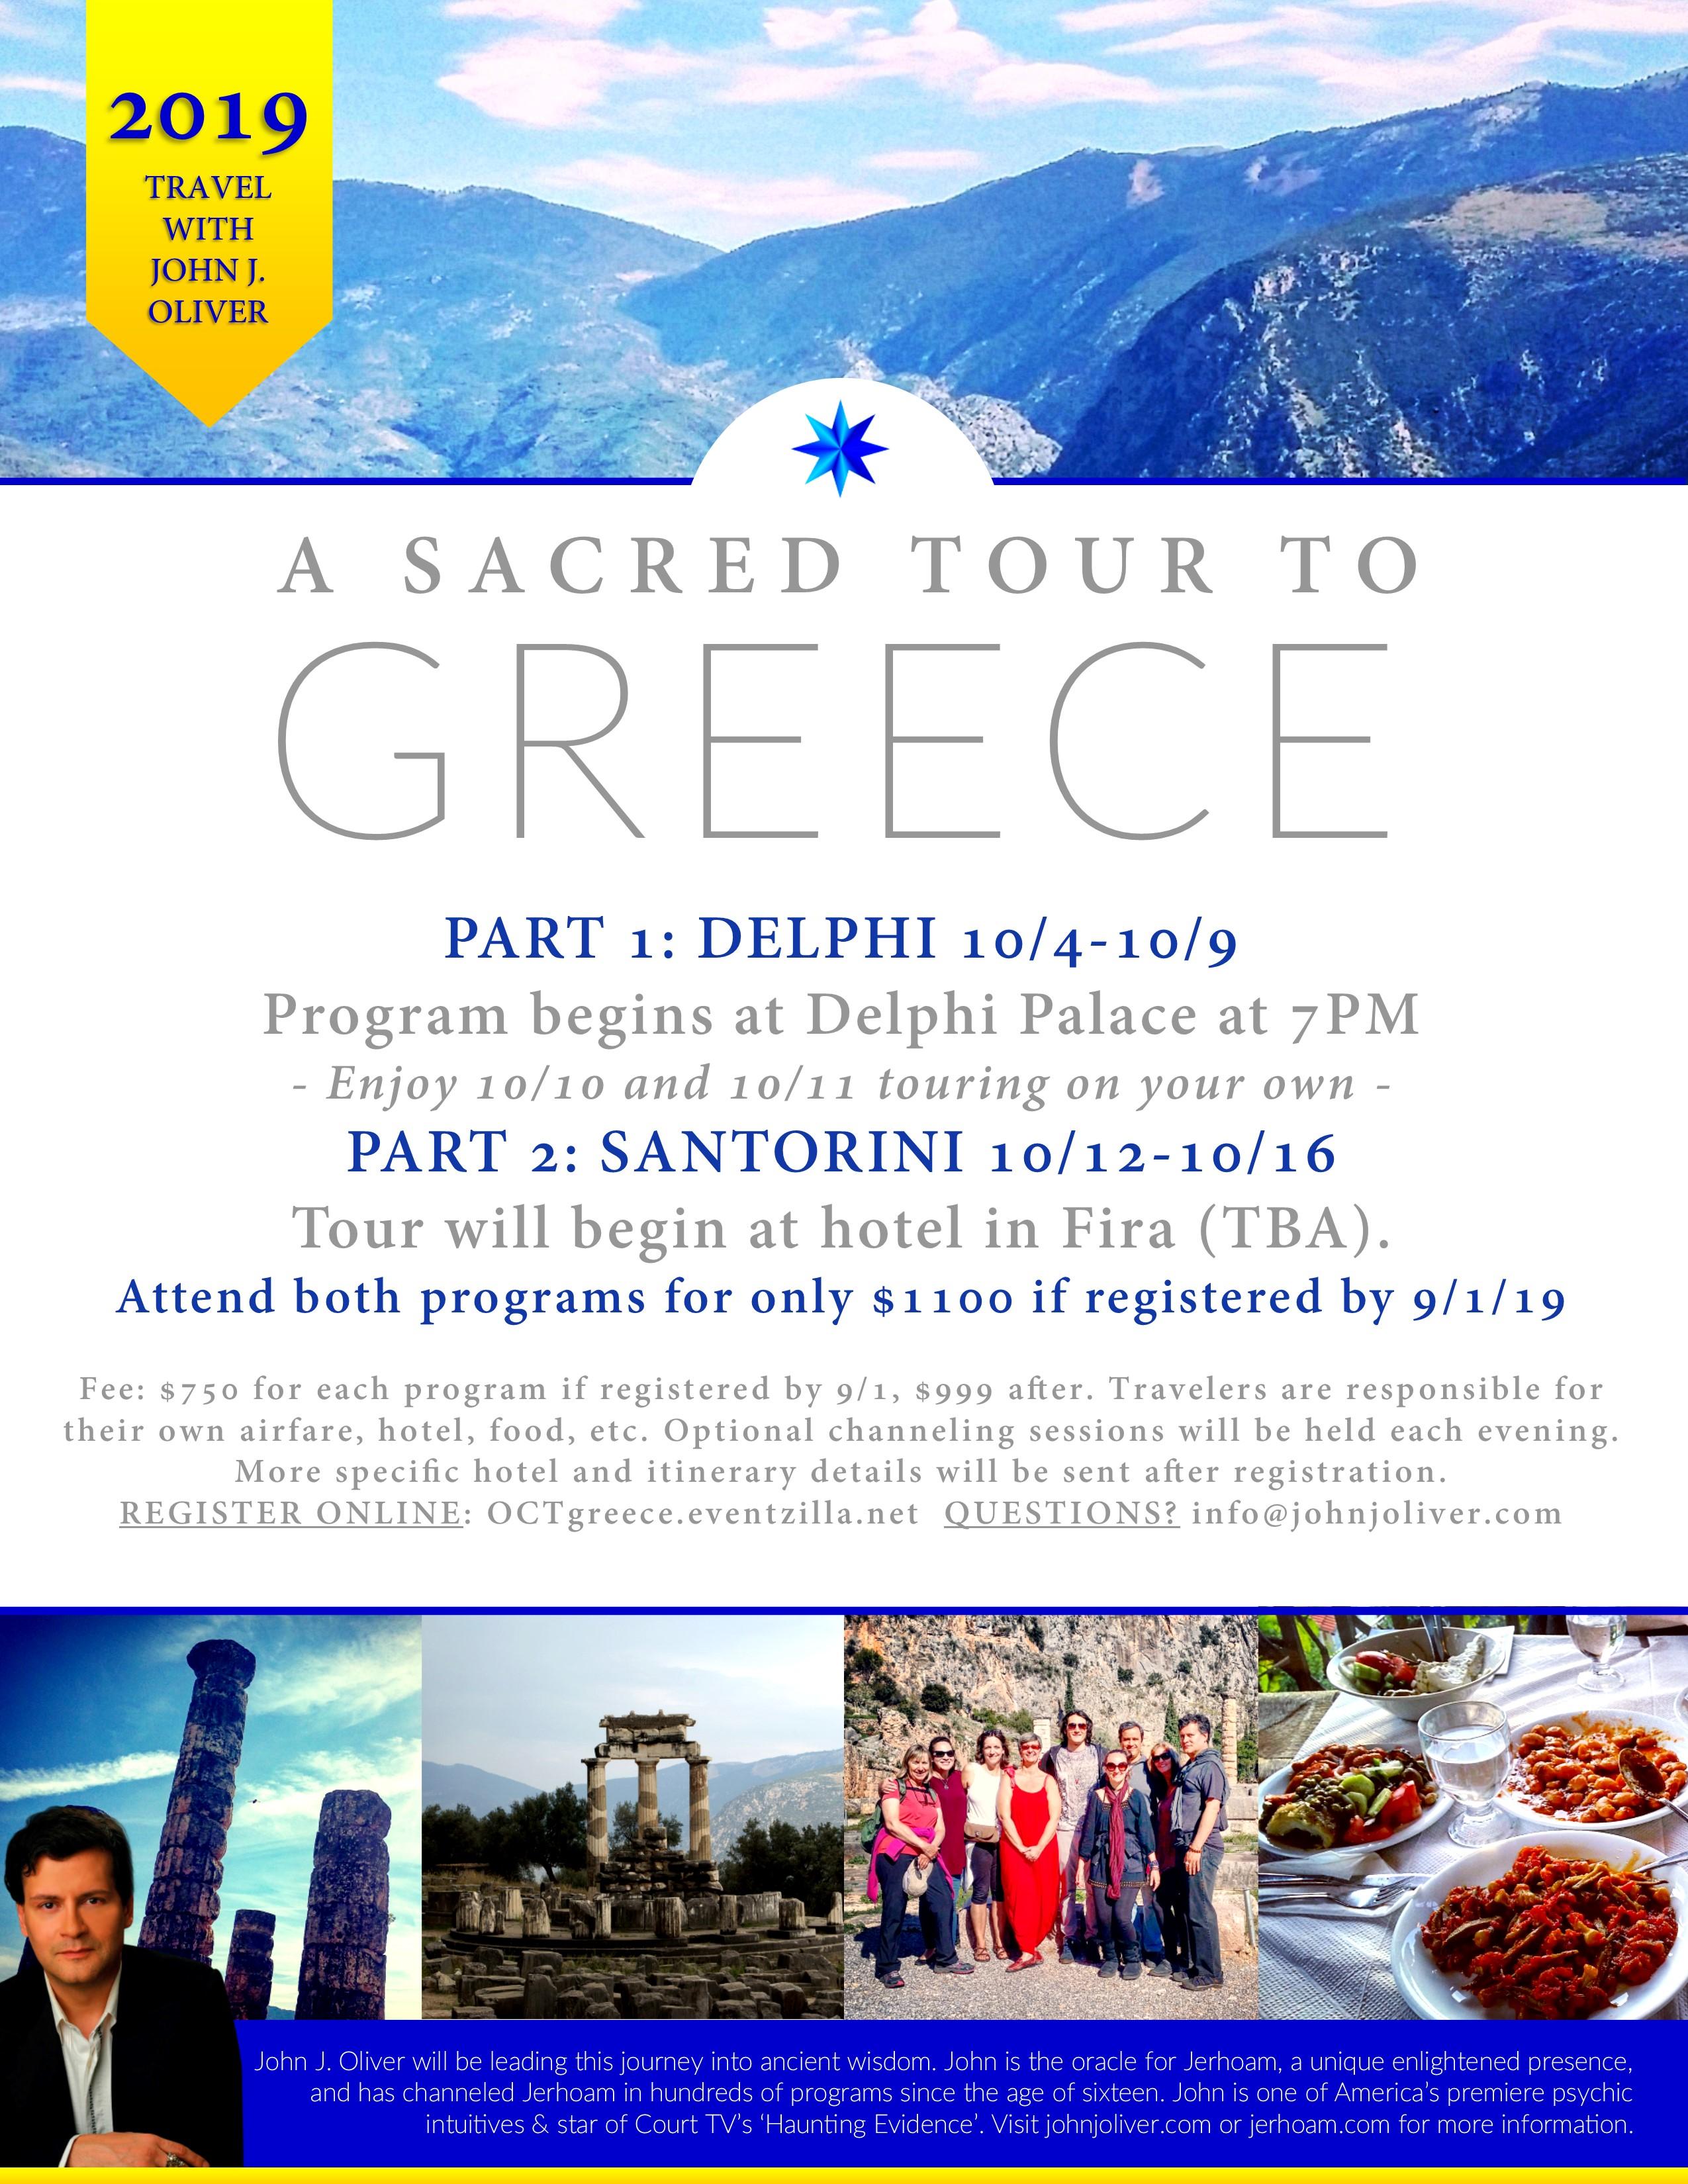 A Sacred Tour to Greece October 2019